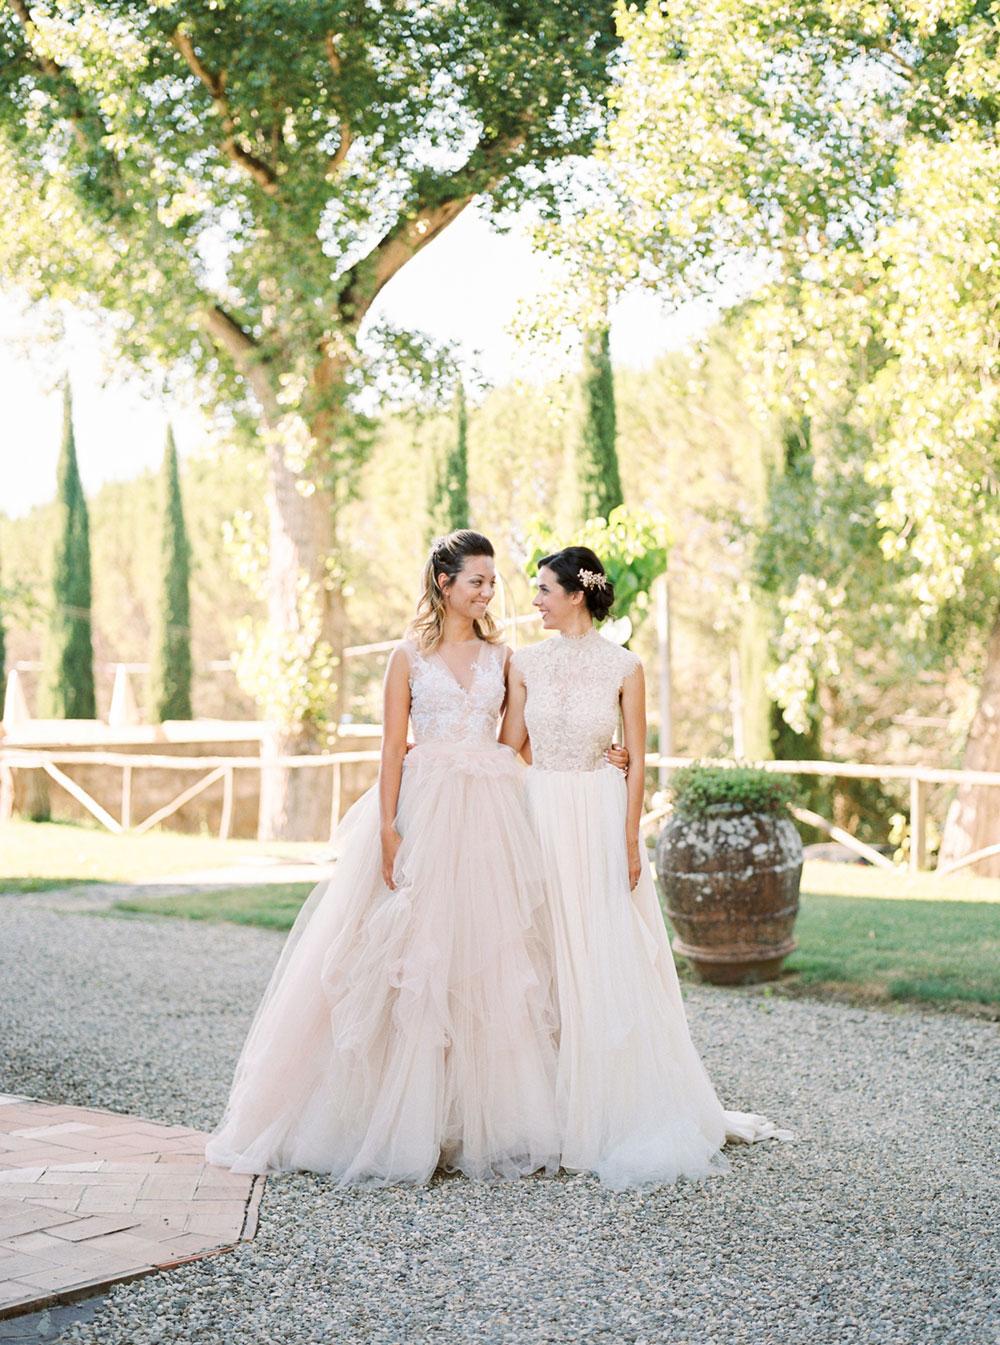 Linari-Tuscany-Elopement-Courtney-Michaela-234